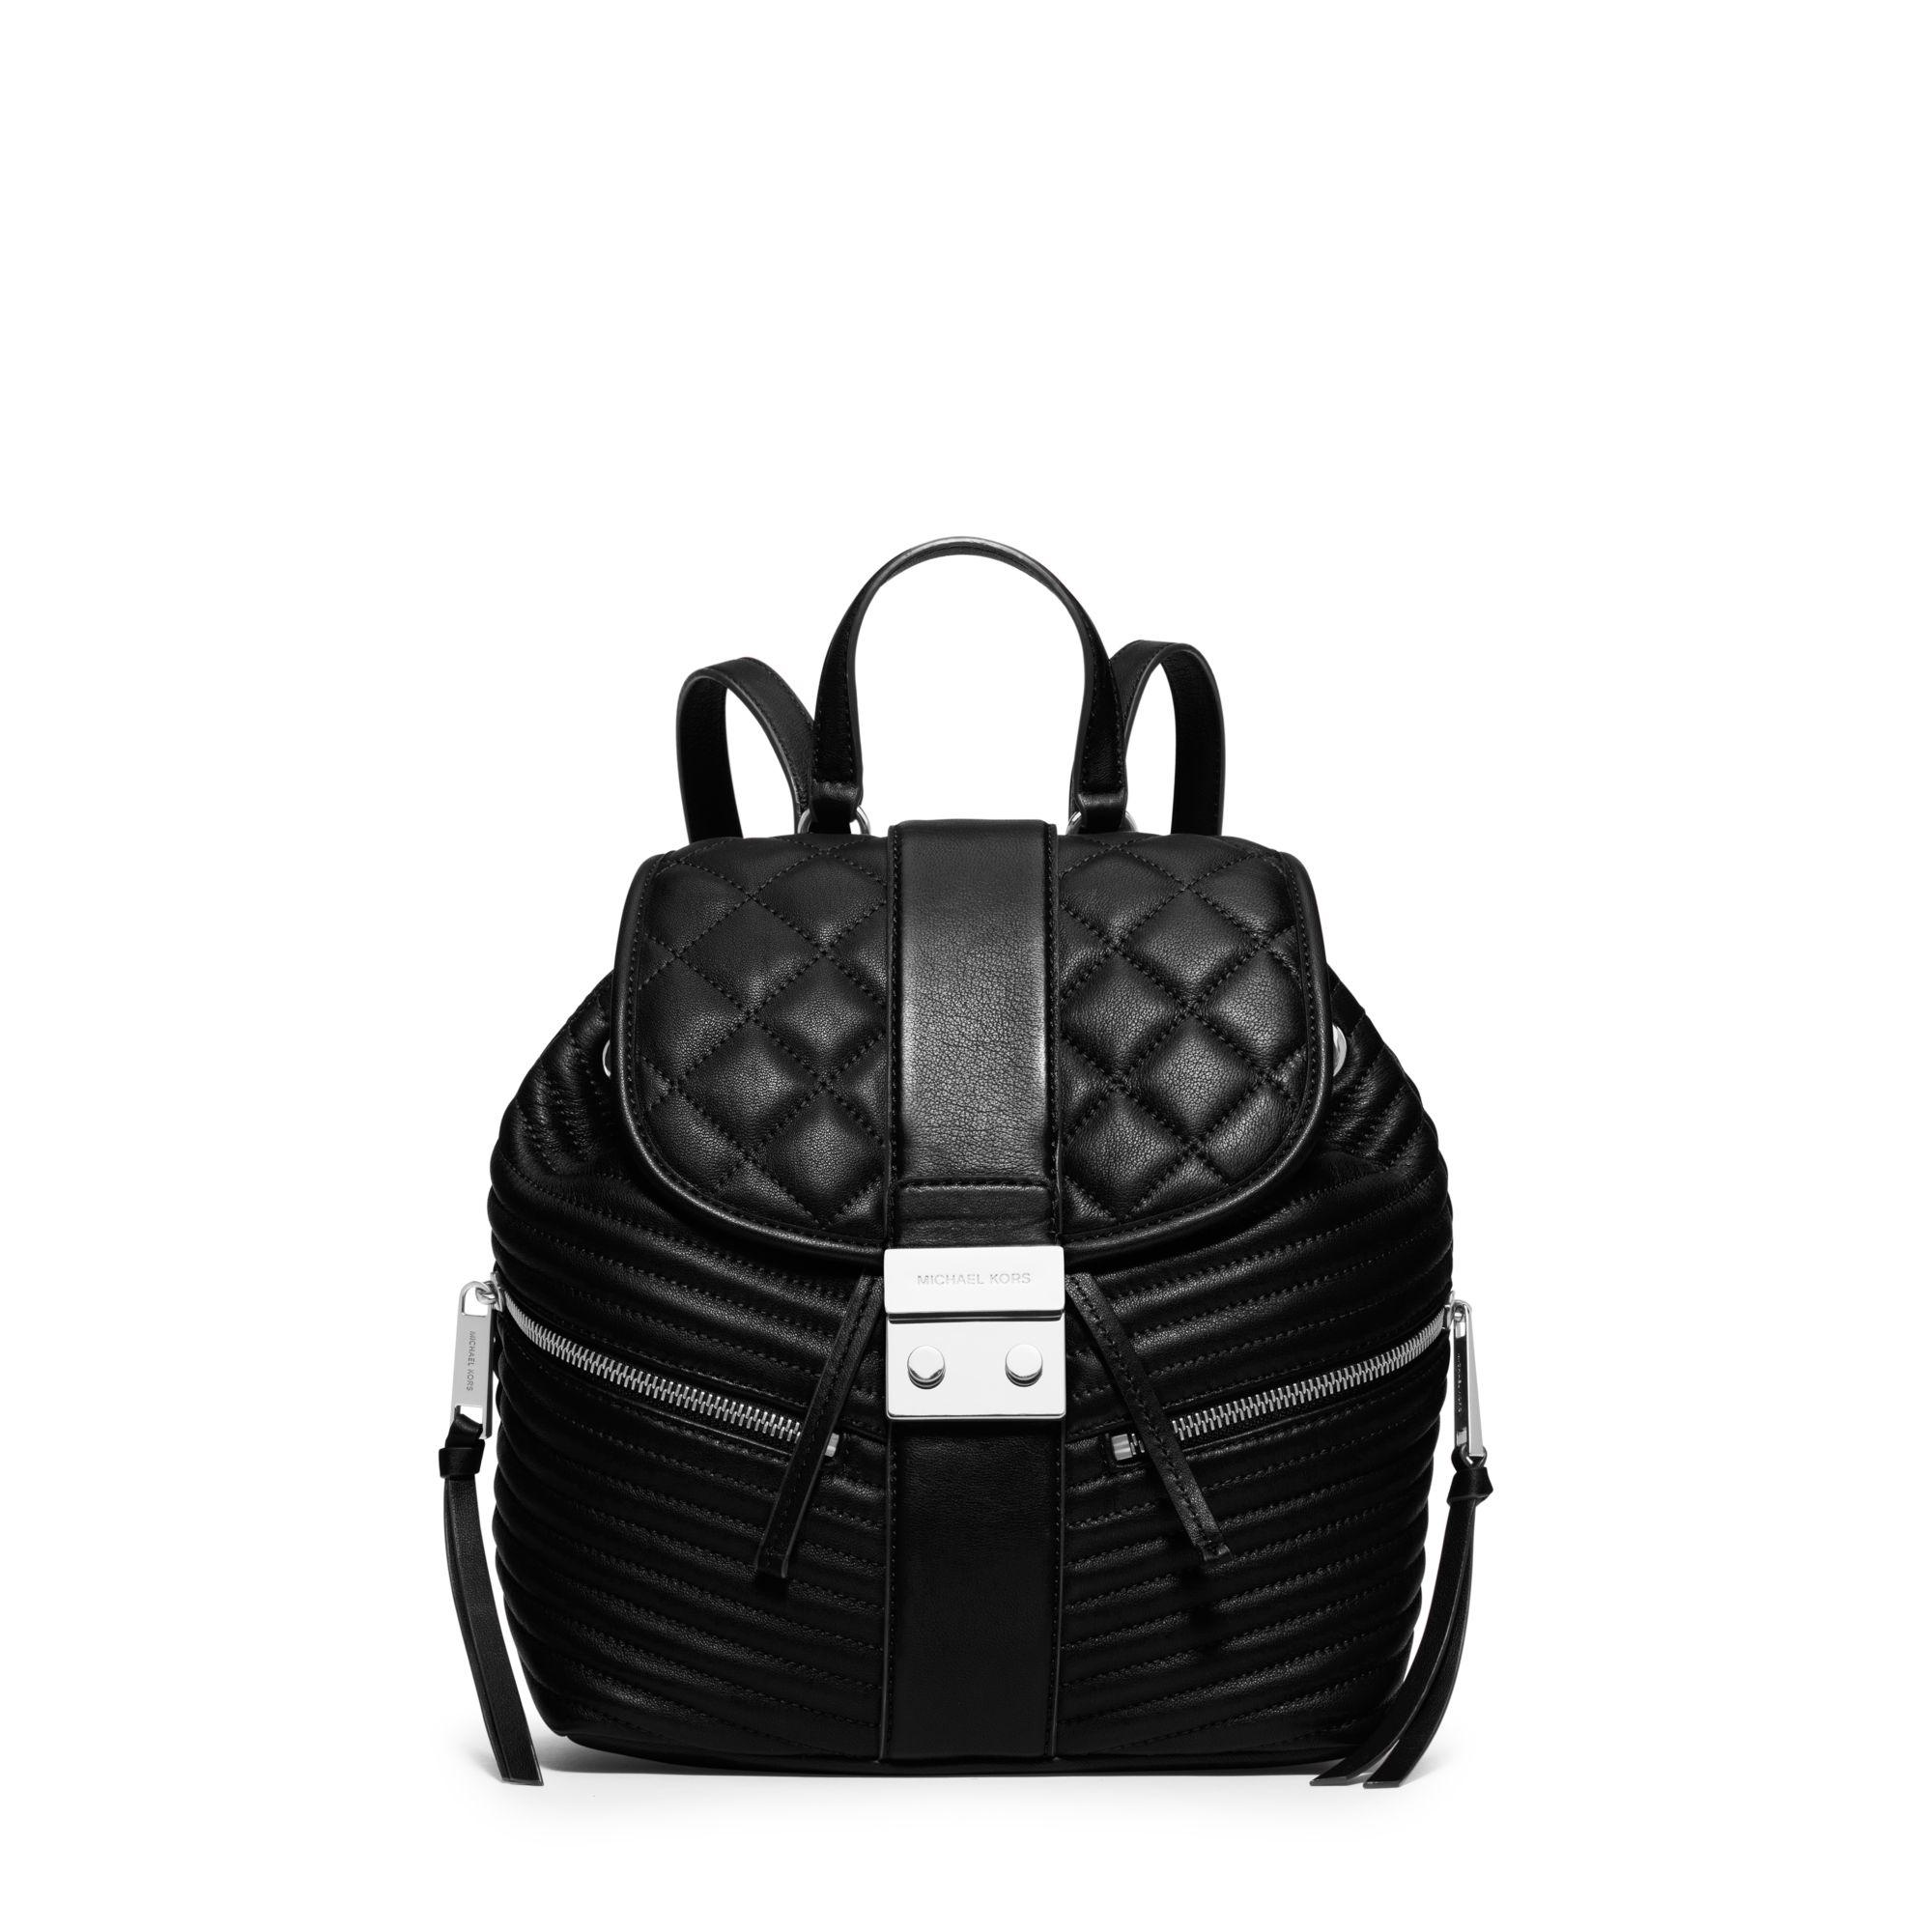 michael kors elisa small leather backpack in black lyst. Black Bedroom Furniture Sets. Home Design Ideas